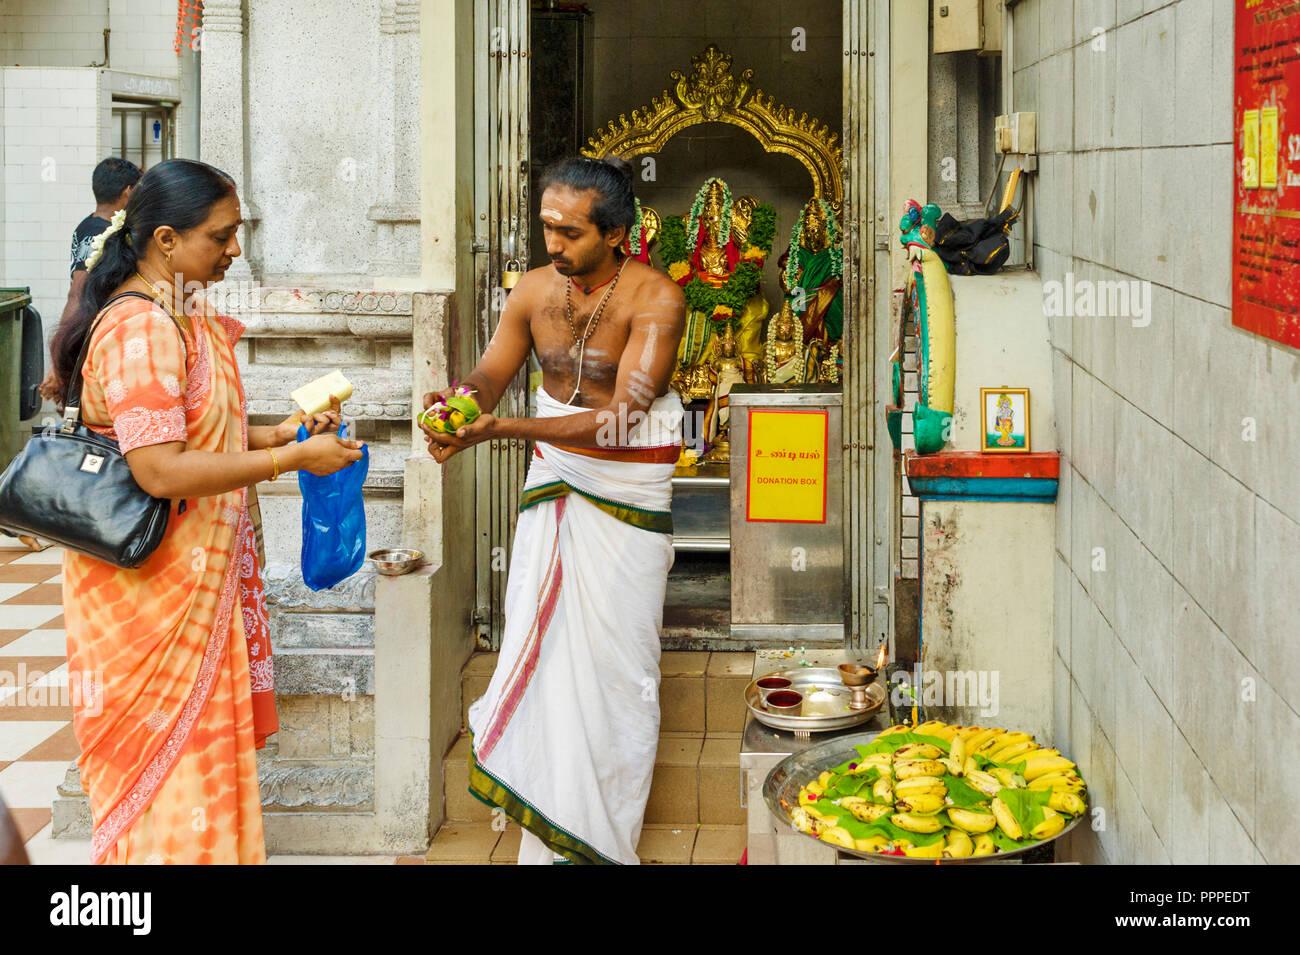 Singapore, brahman priest in the Sri Veeramakaliamman Temple - Stock Image